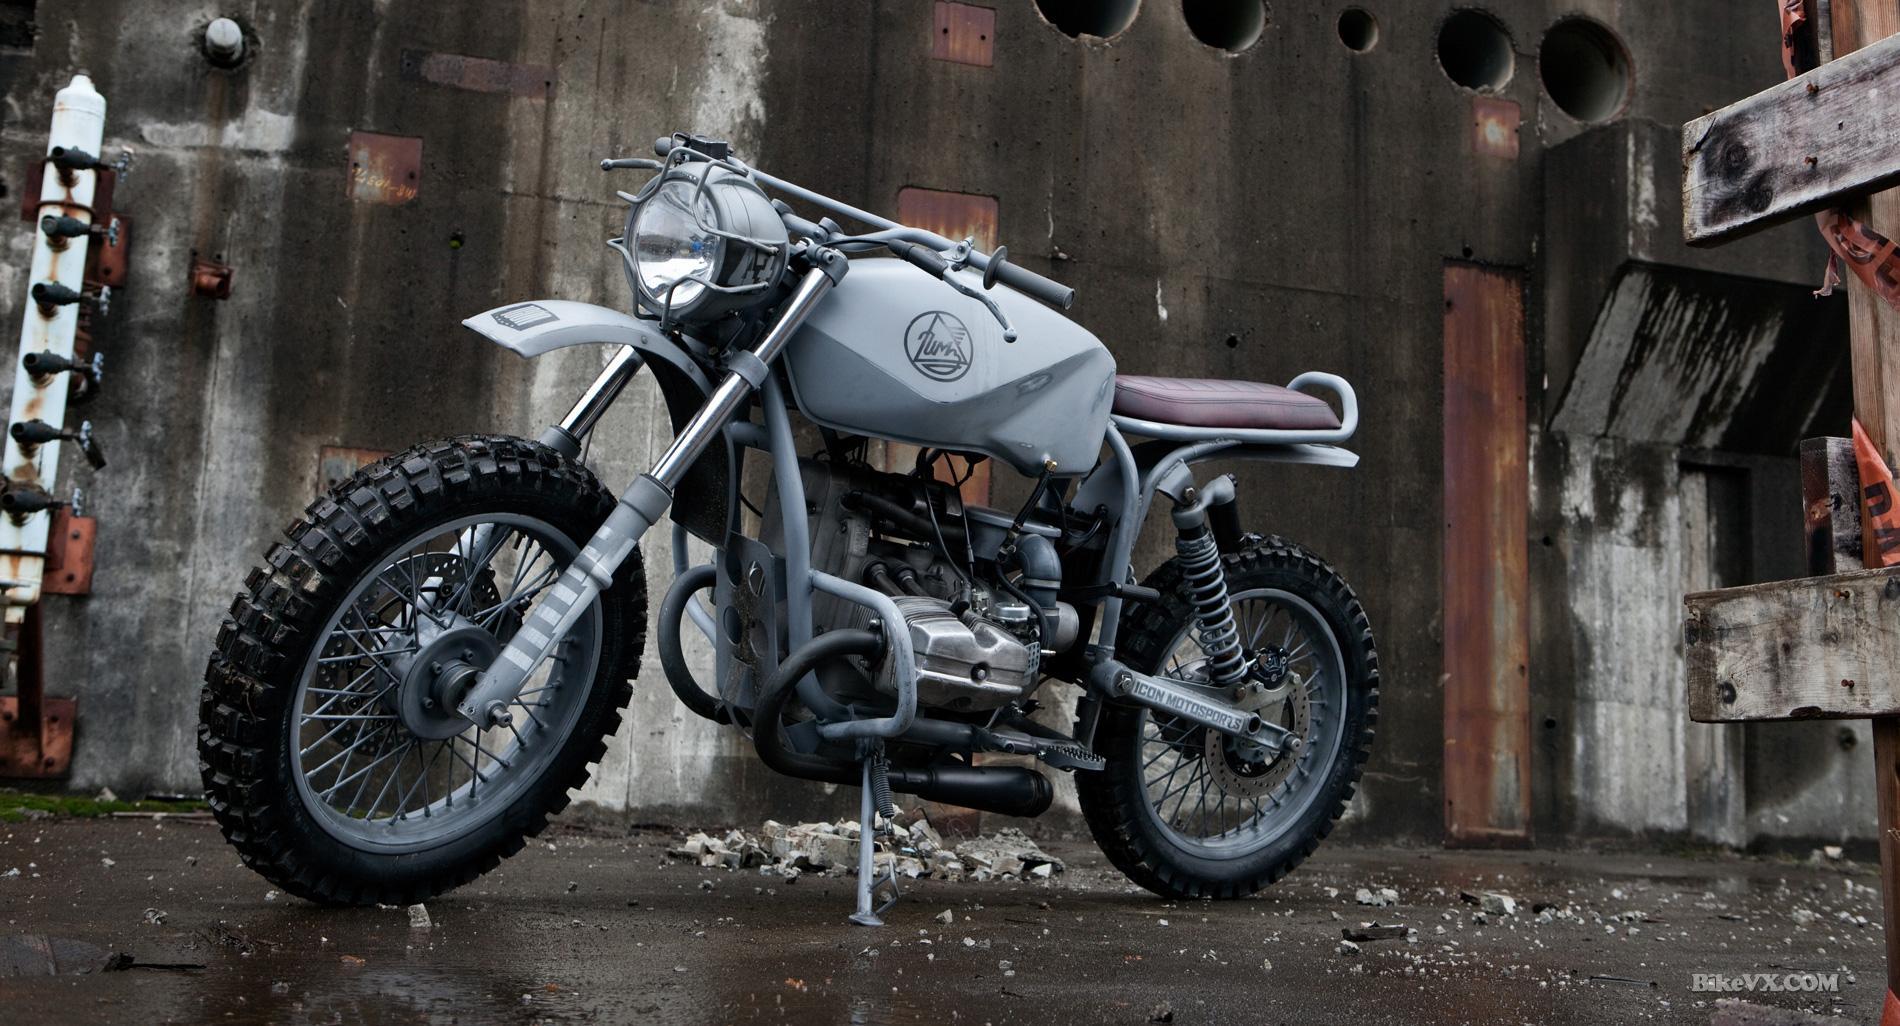 Quarter master Ural solo custom